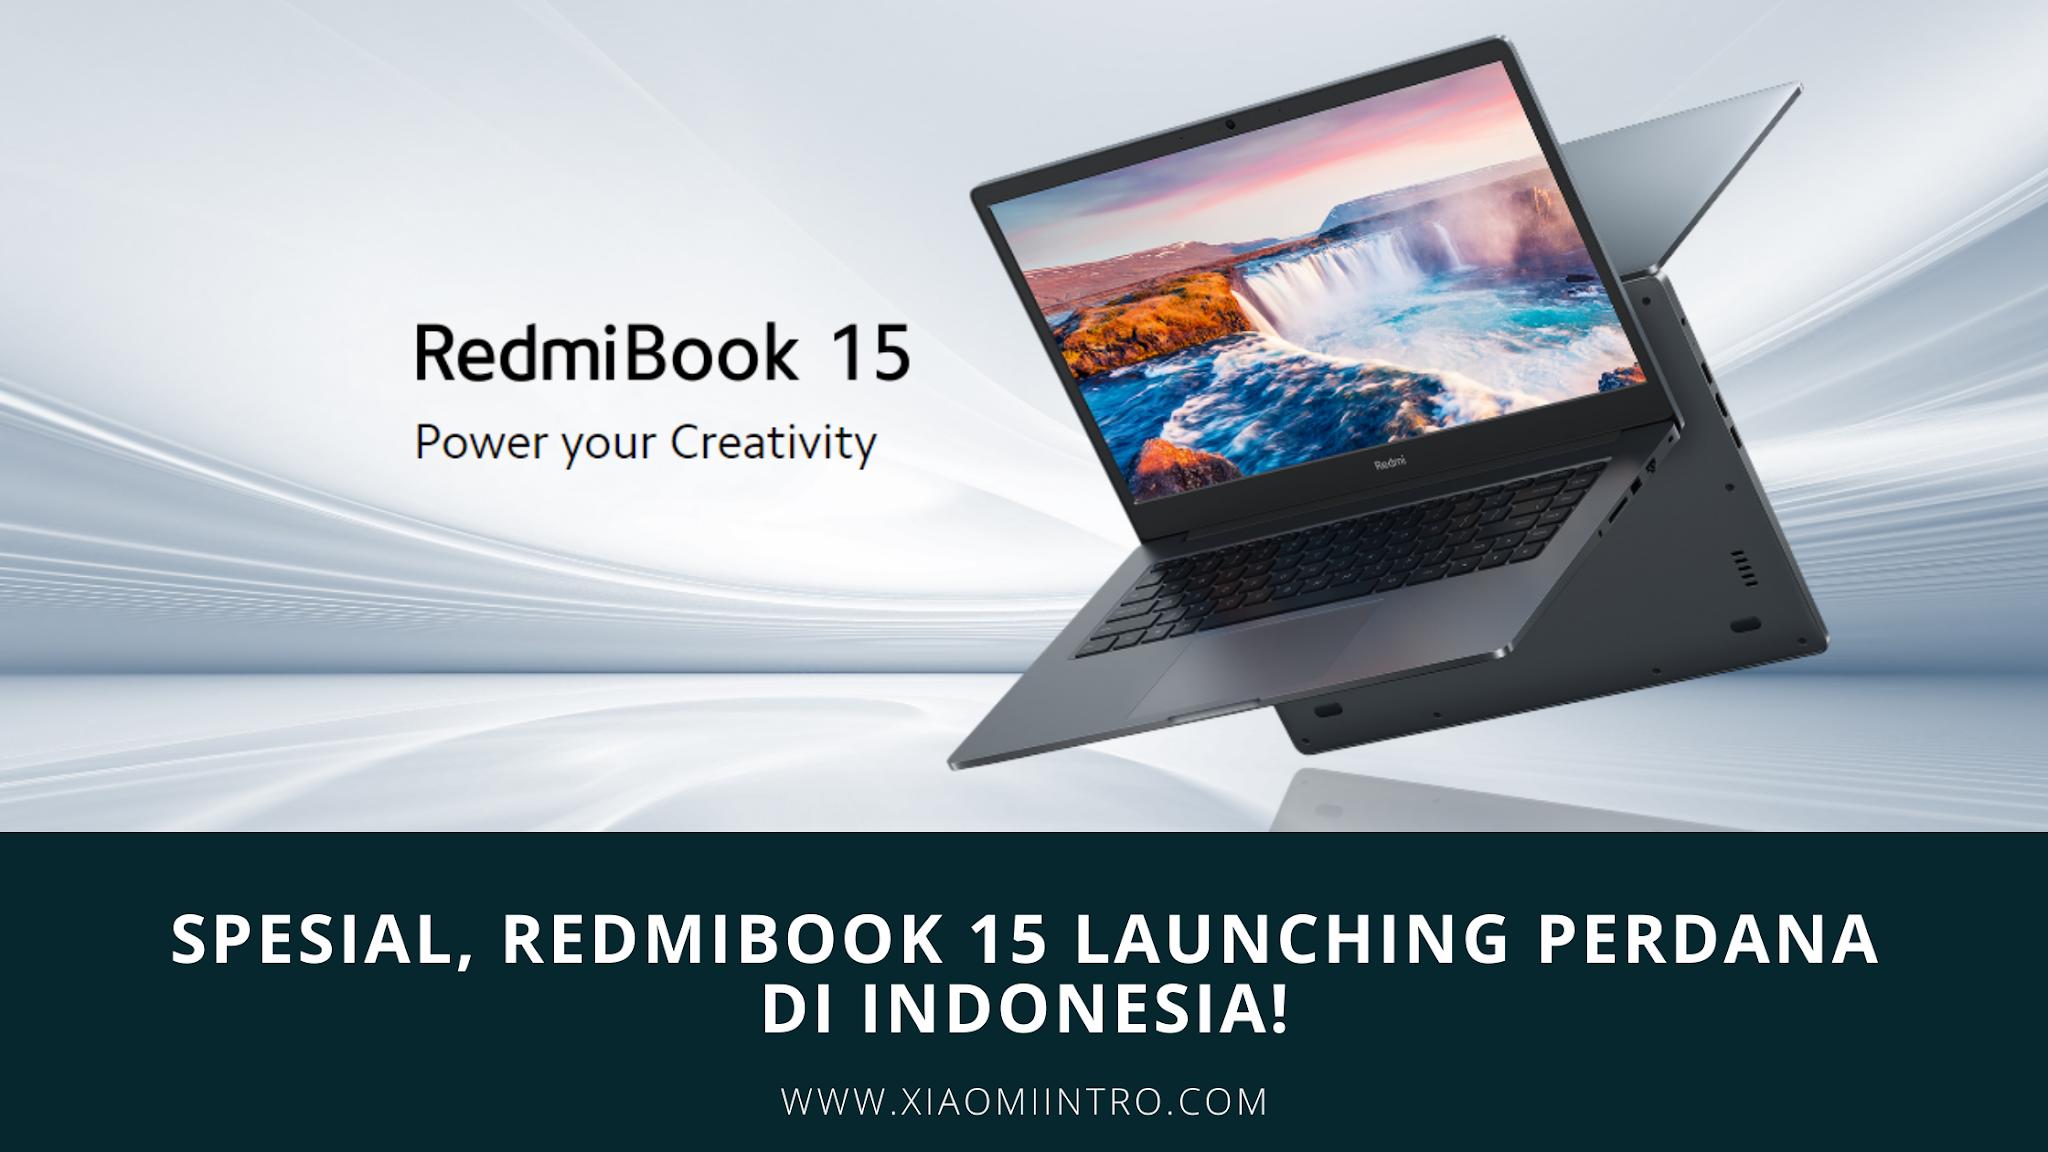 Spesial, Redmibook 15 Launching Perdana Di Indonesia!